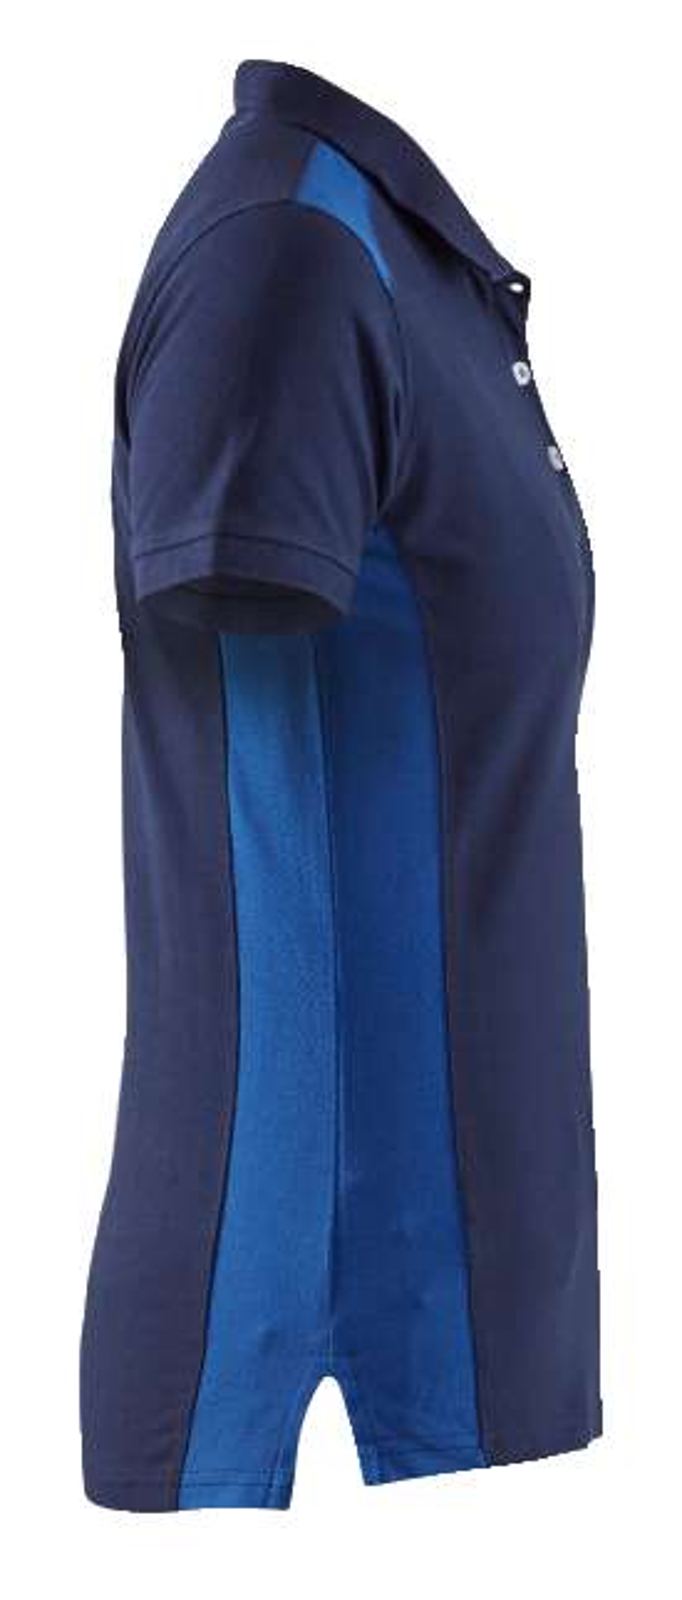 Blaklader Dames polo shirts 33901050 marineblauw-korenblauw(8985)